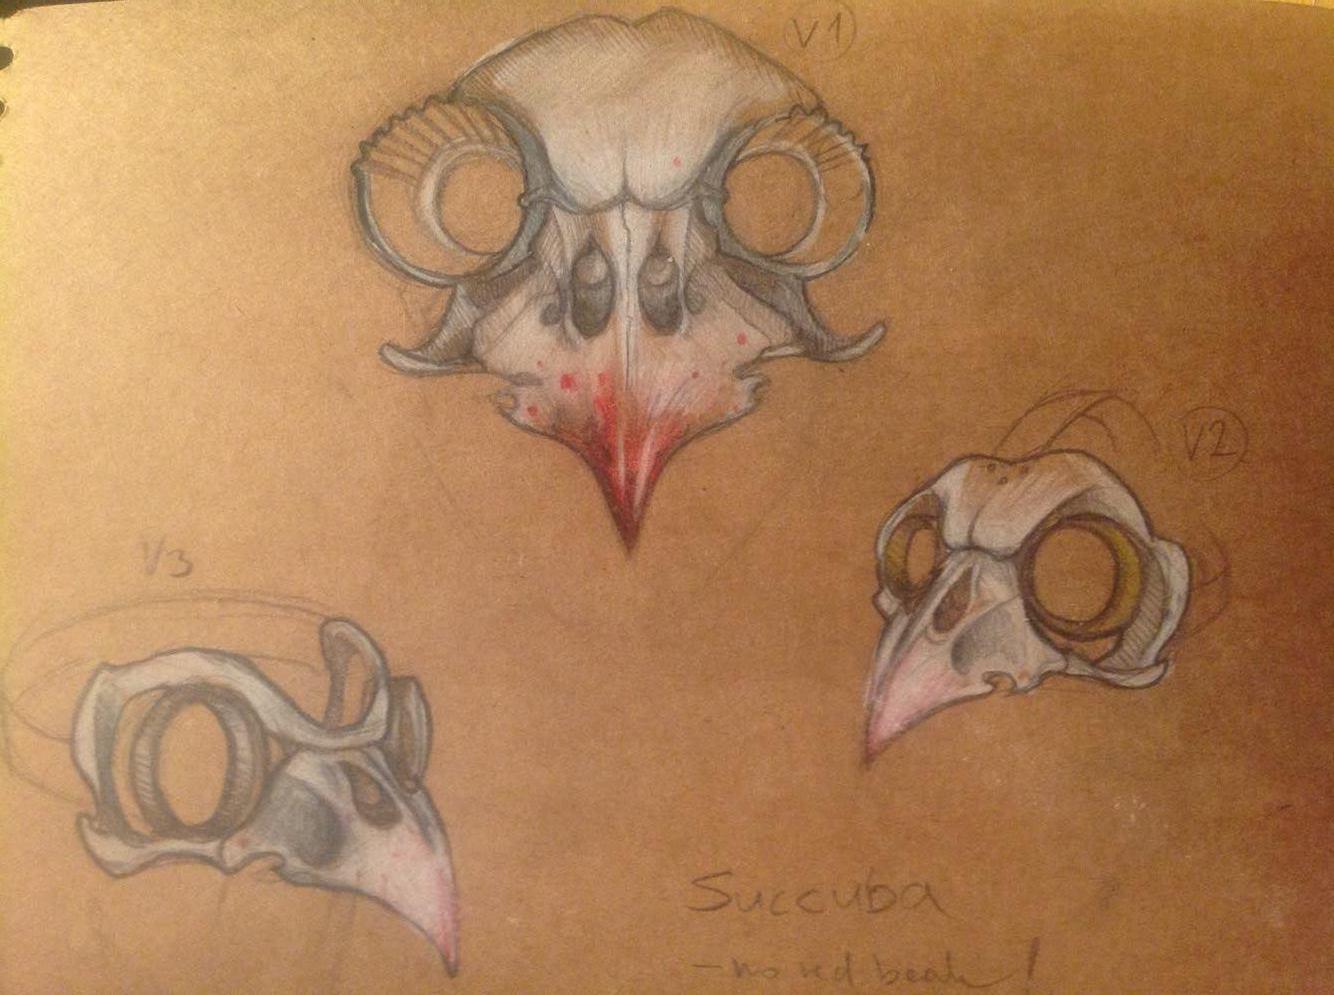 SCUBA- BIRD LEONORA